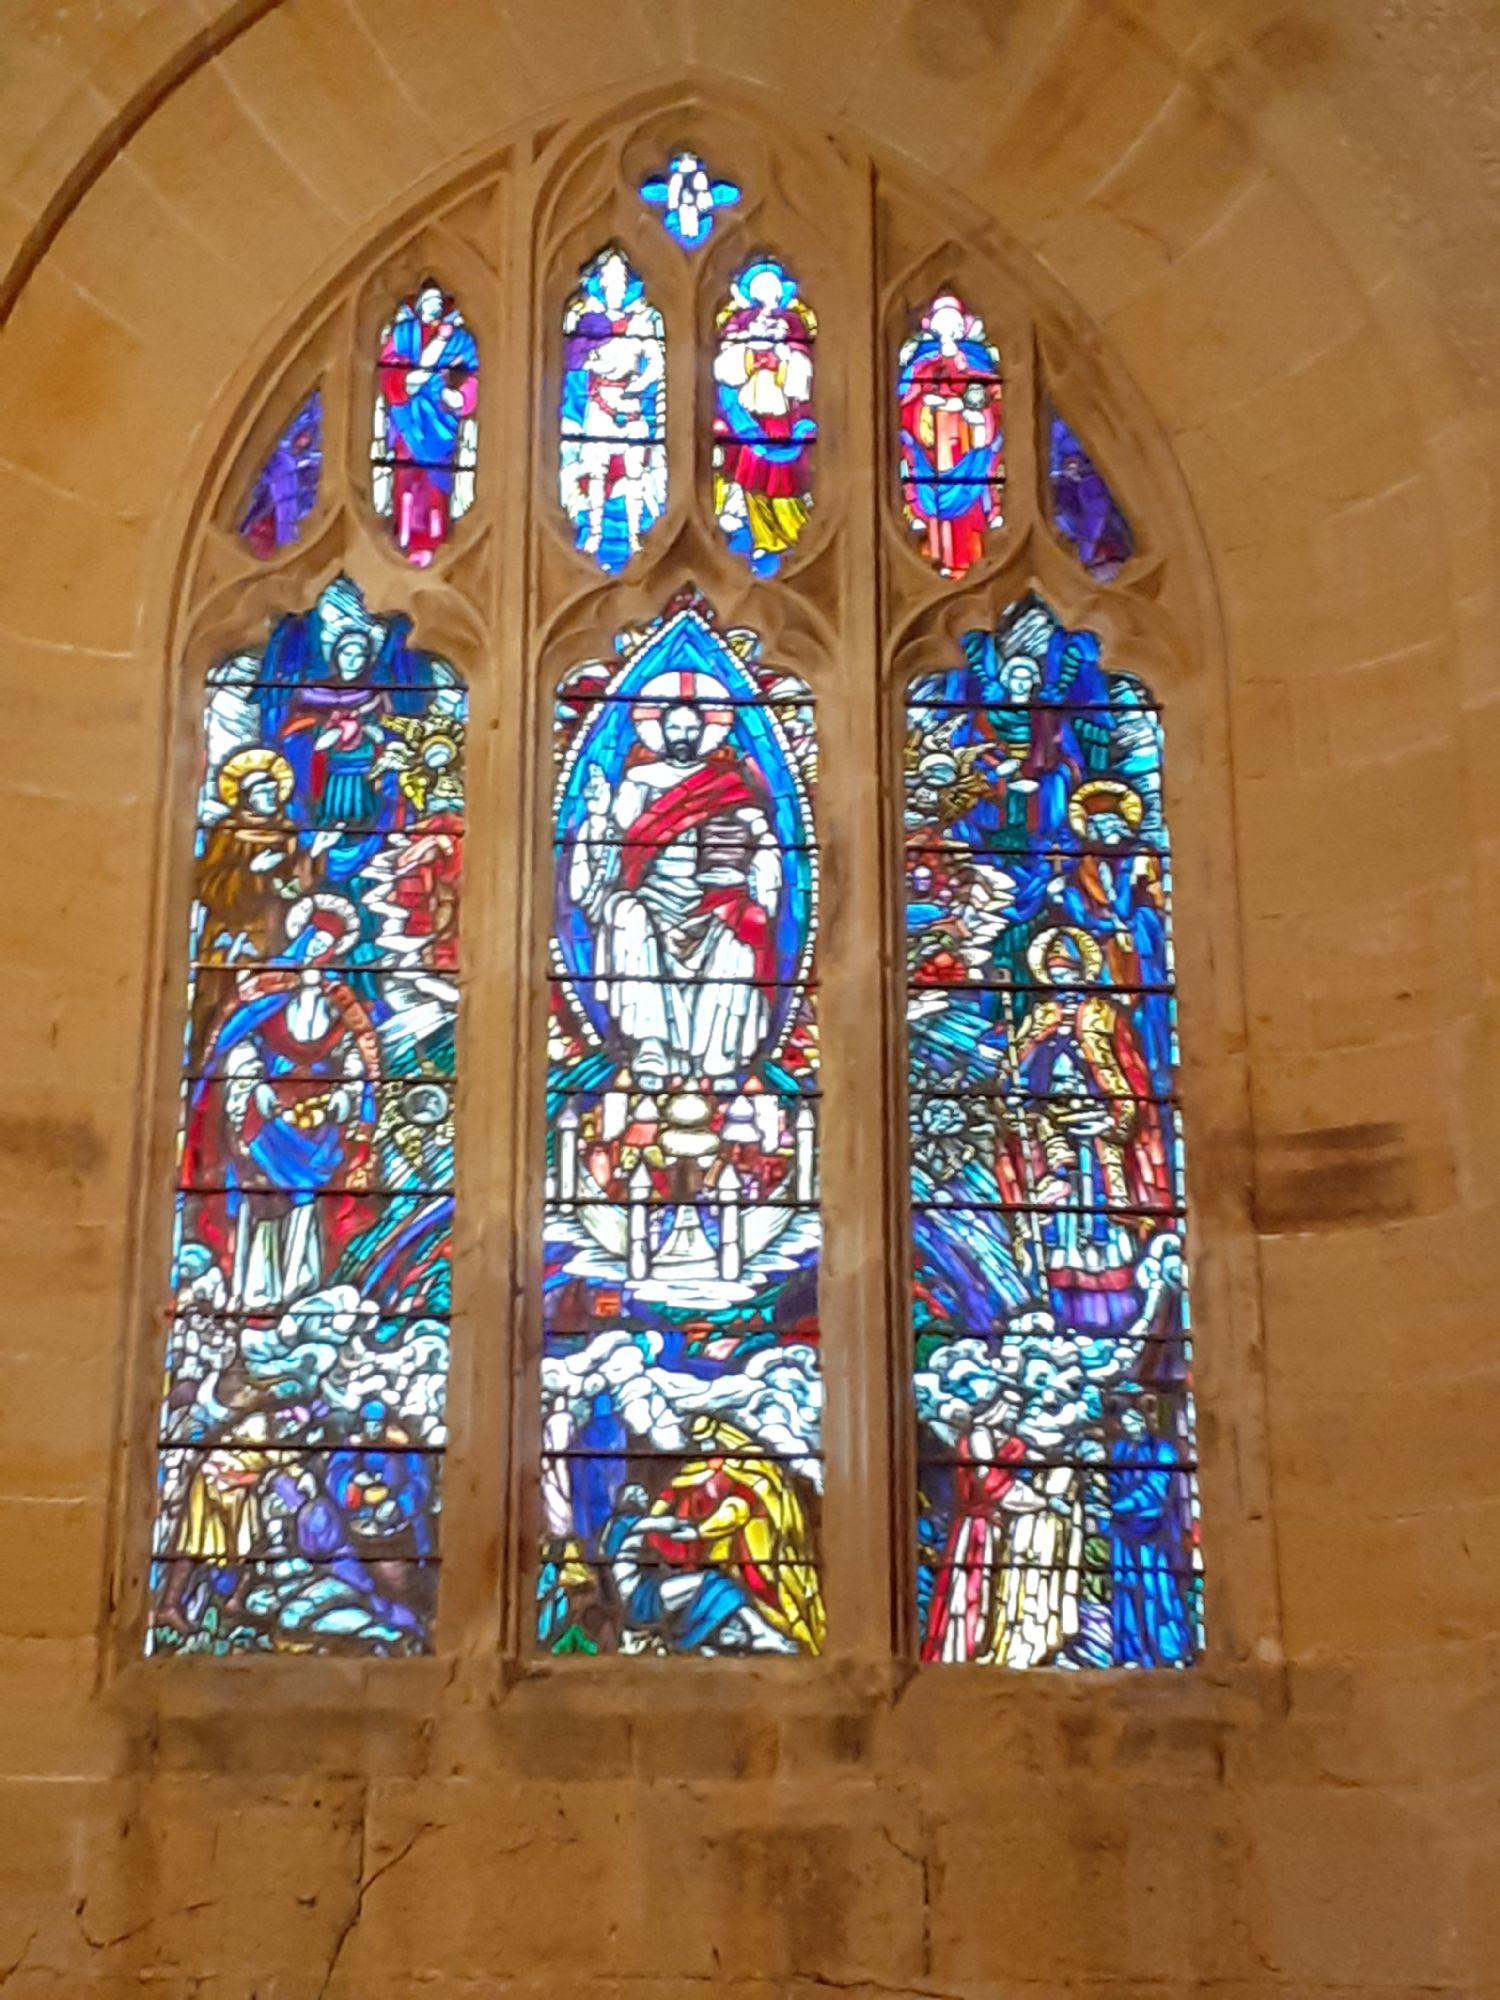 West window by Rosemary Everett